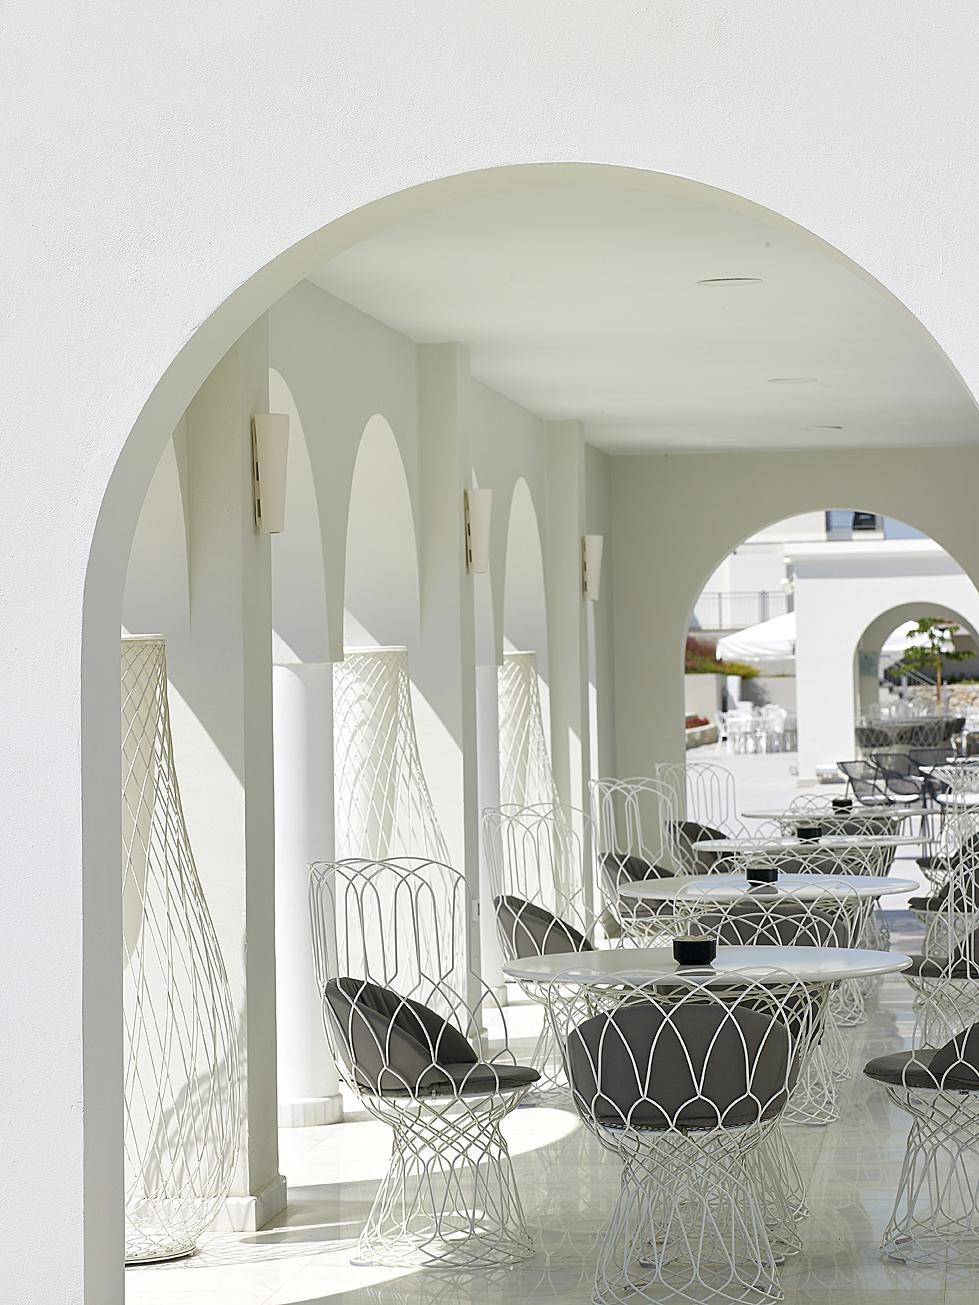 Mexil design hotel anemos luxury grand resort crete for Design hotel crete